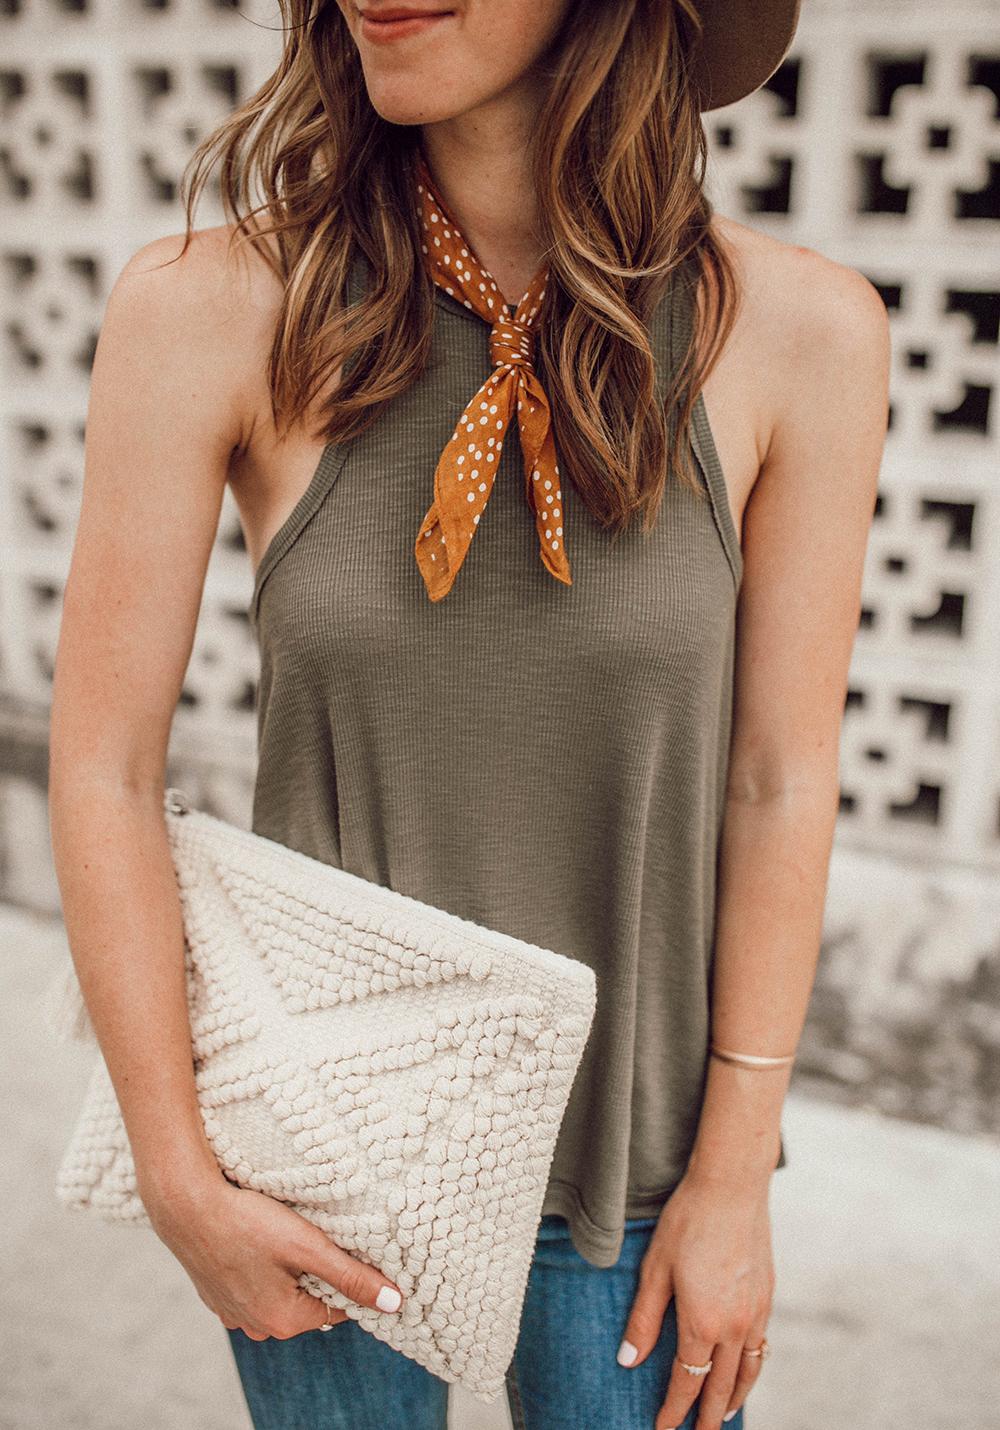 livvyland-blog-olivia-watson-austin-texas-fashion-style-blogger-sole-society-tan-sandal-wedges-6